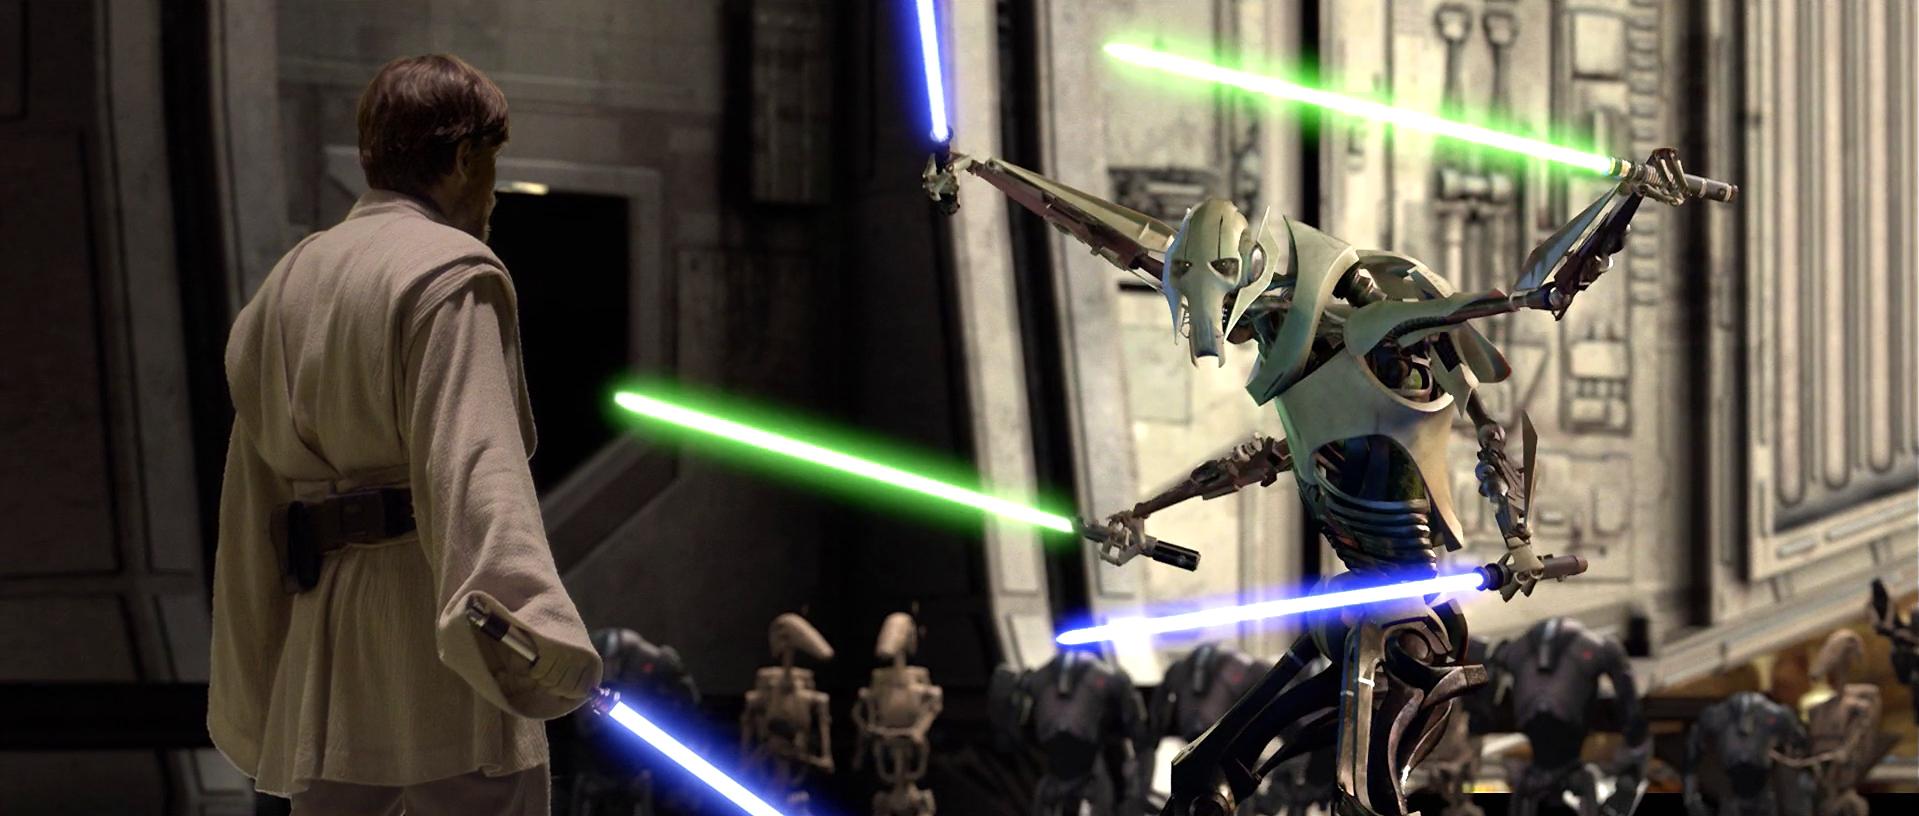 Star Wars Episode Iii Revenge Of The Sith Limited Edition Steelbook Blu Ray Zavvi Uk